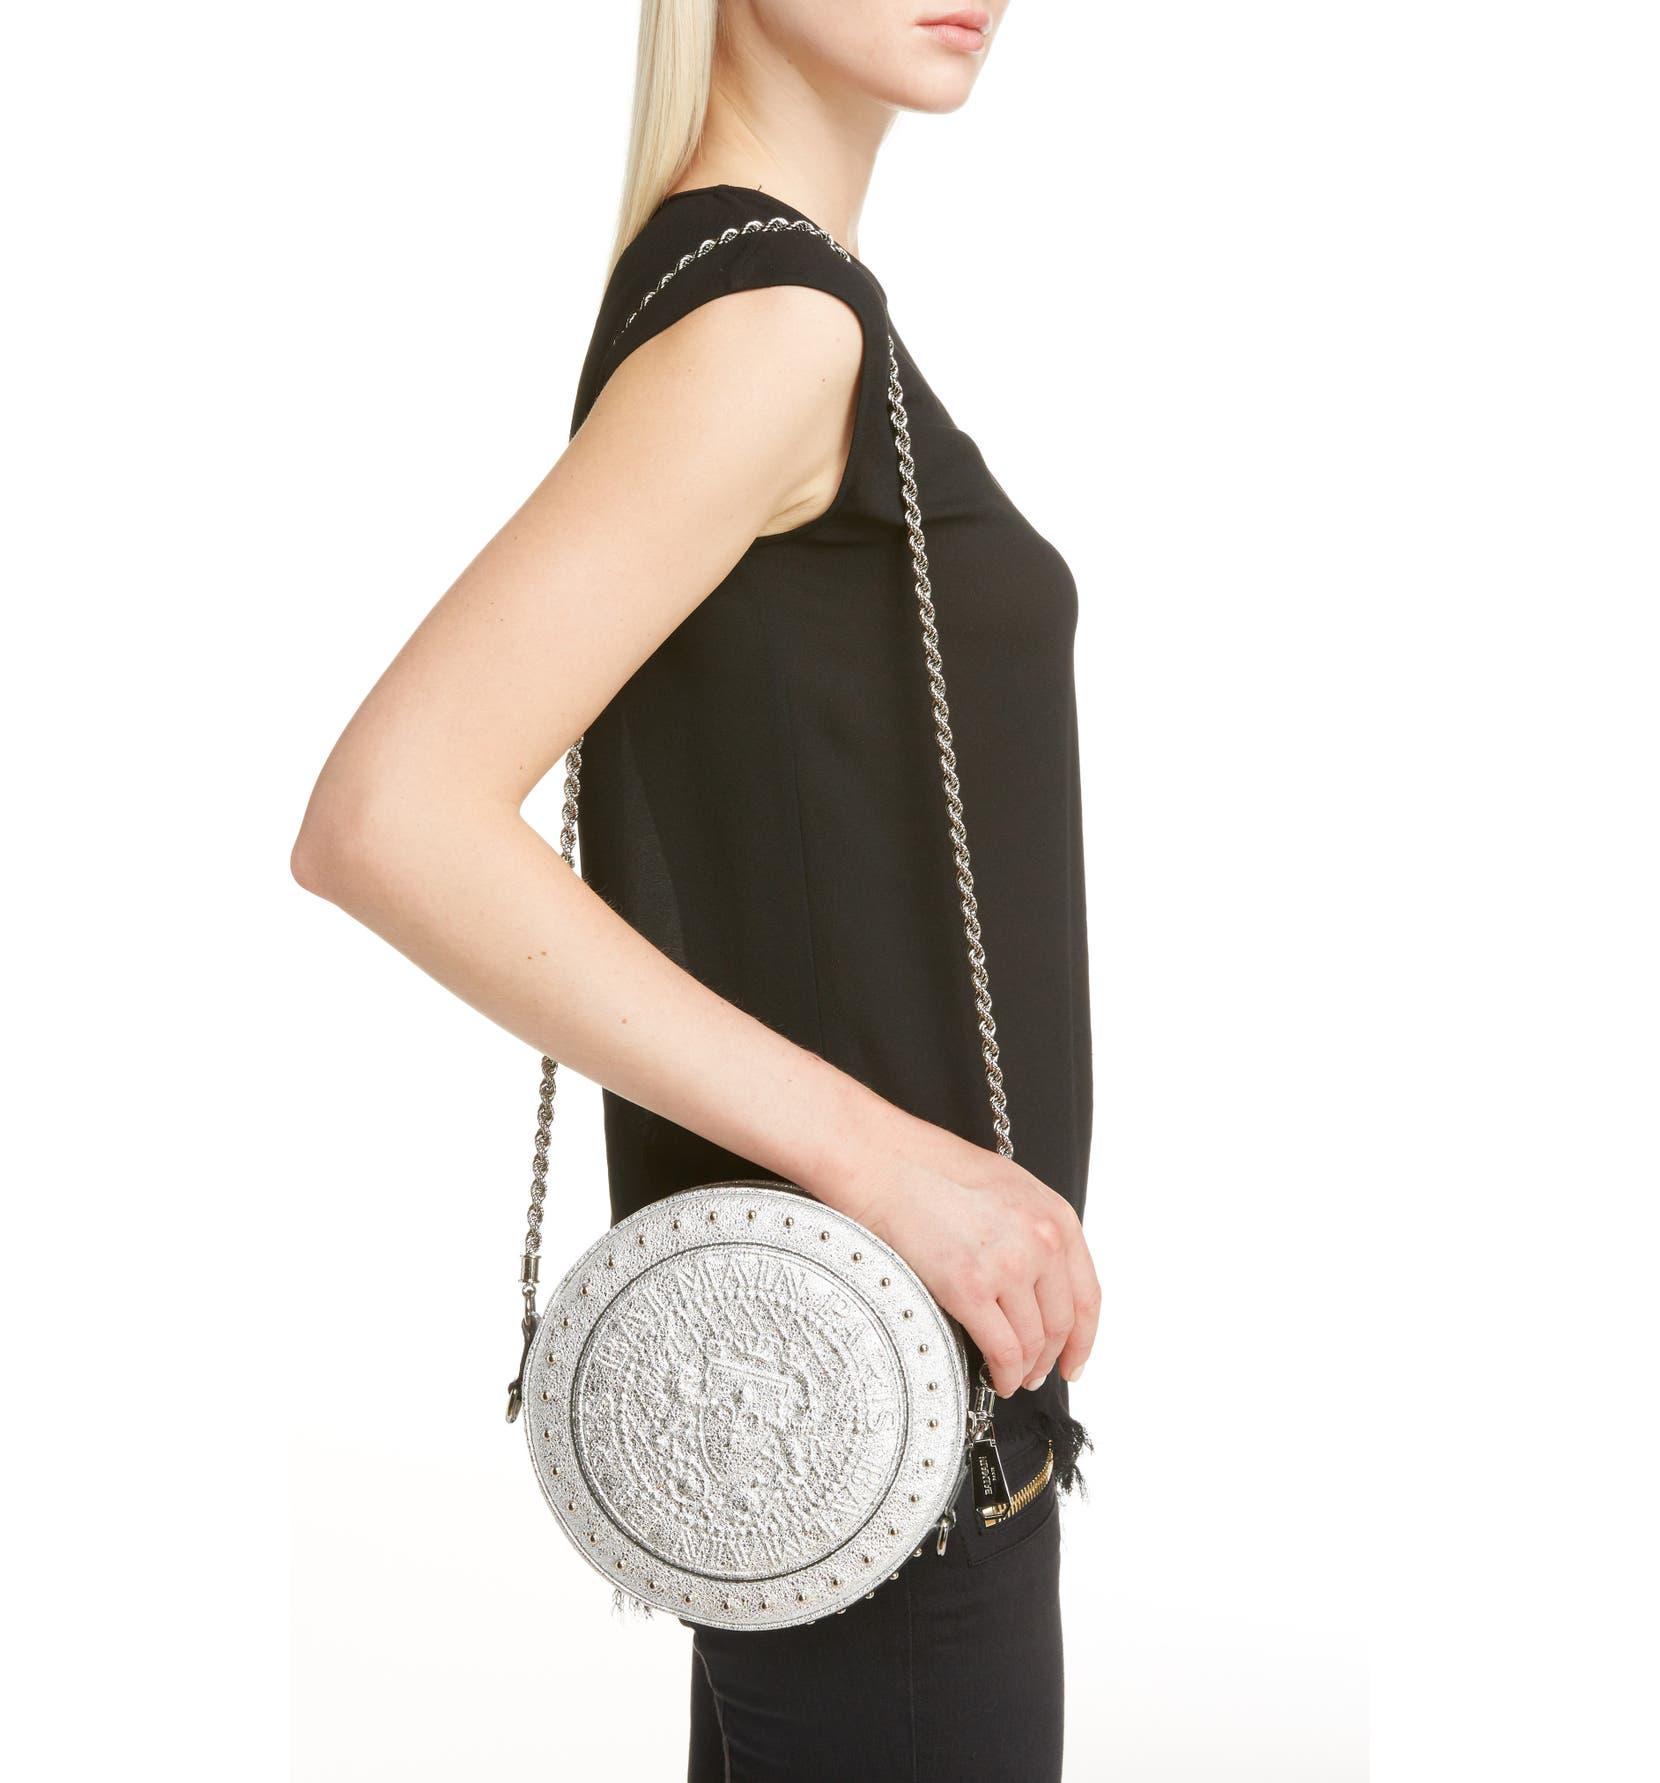 726cac9f1e Balmain Renaissance Leather Crossbody Bag   Nordstrom